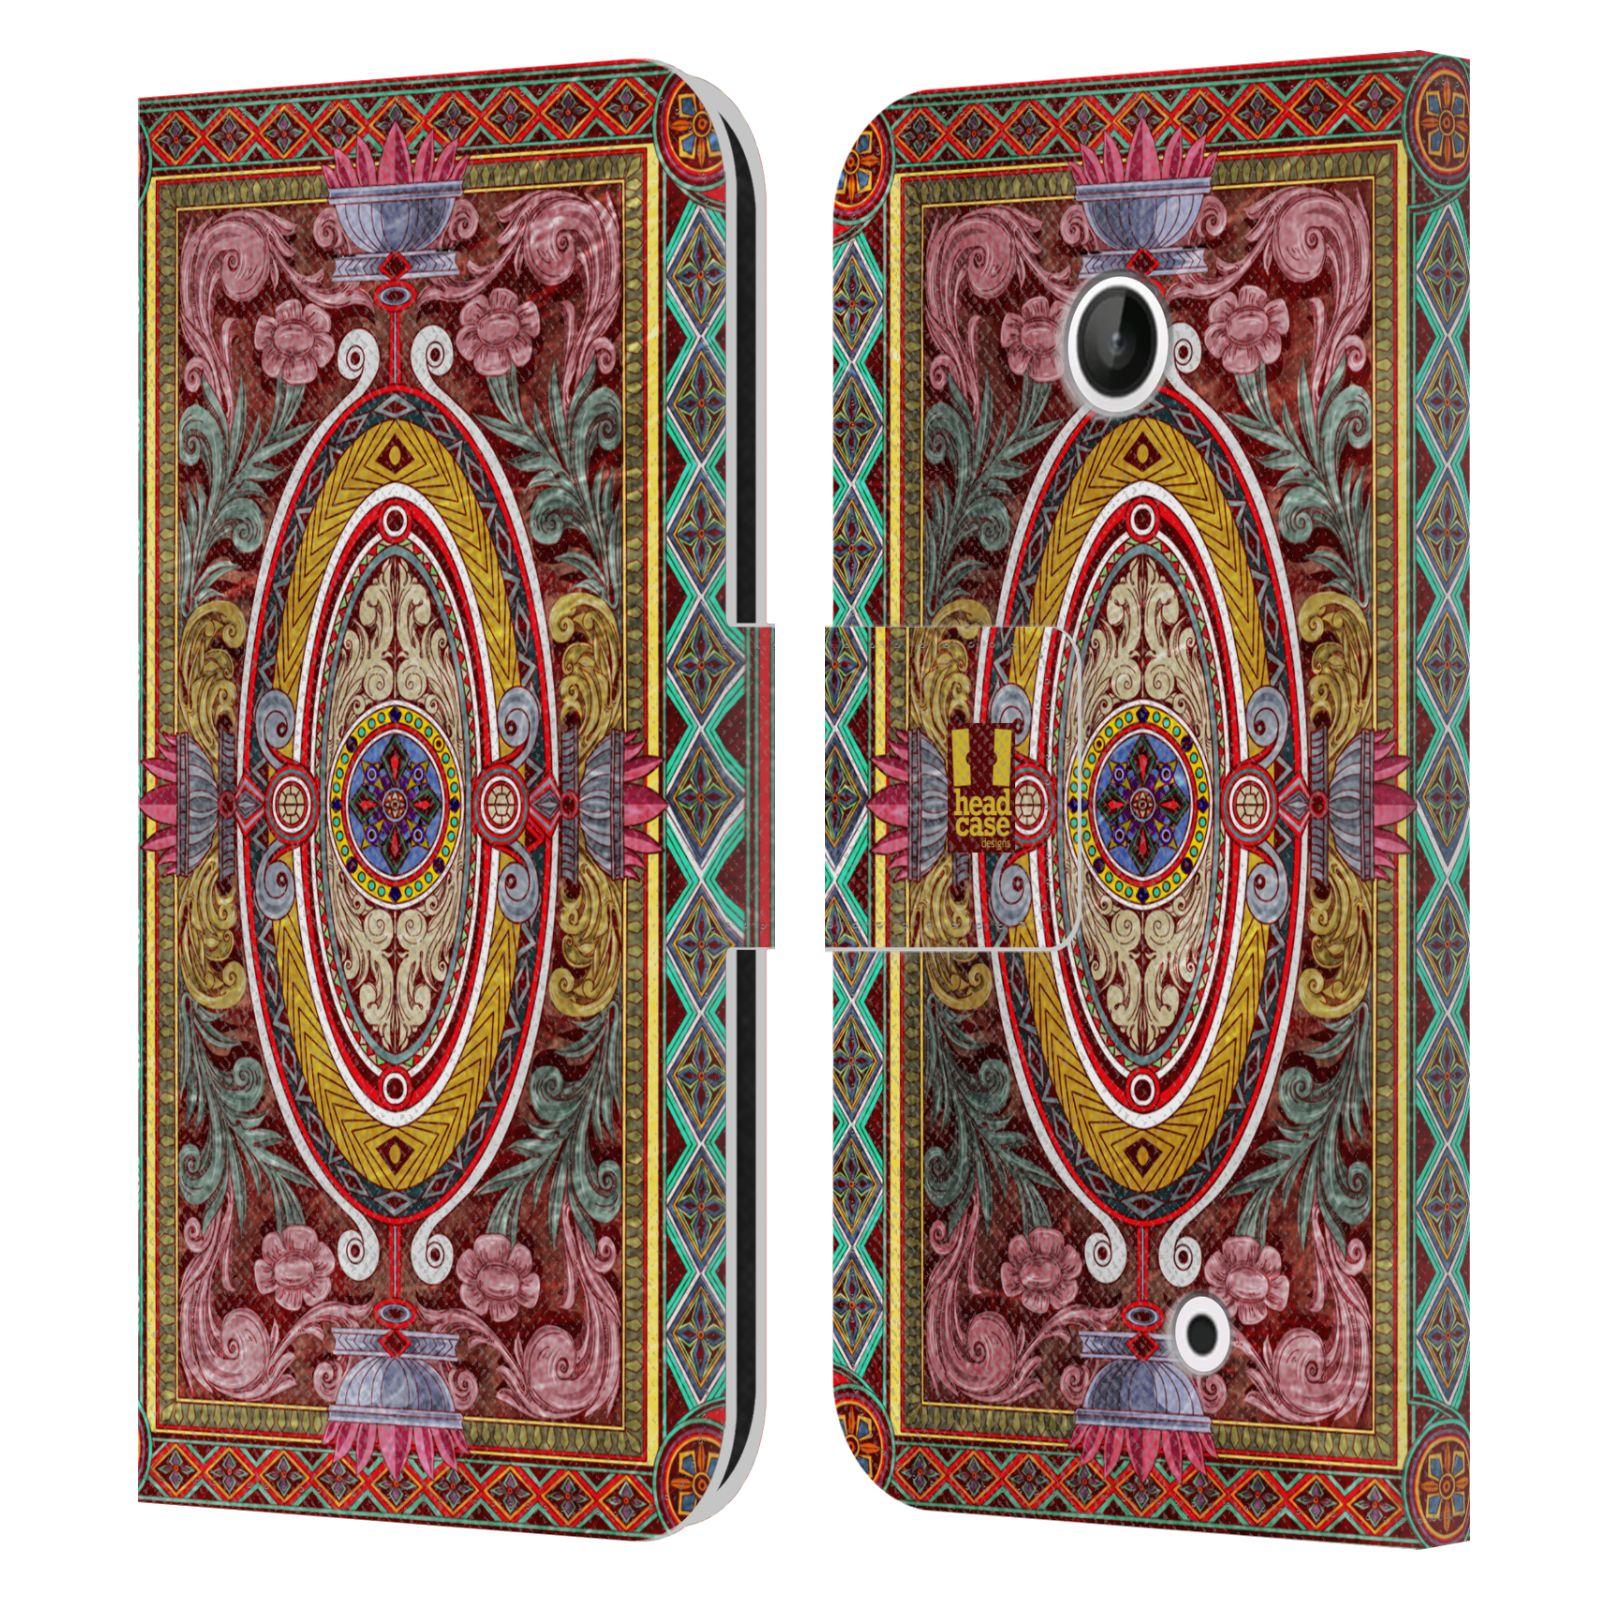 HEAD CASE Flipové pouzdro pro mobil NOKIA LUMIA 630 / LUMIA 630 DUAL ARABESKA Baroko červená